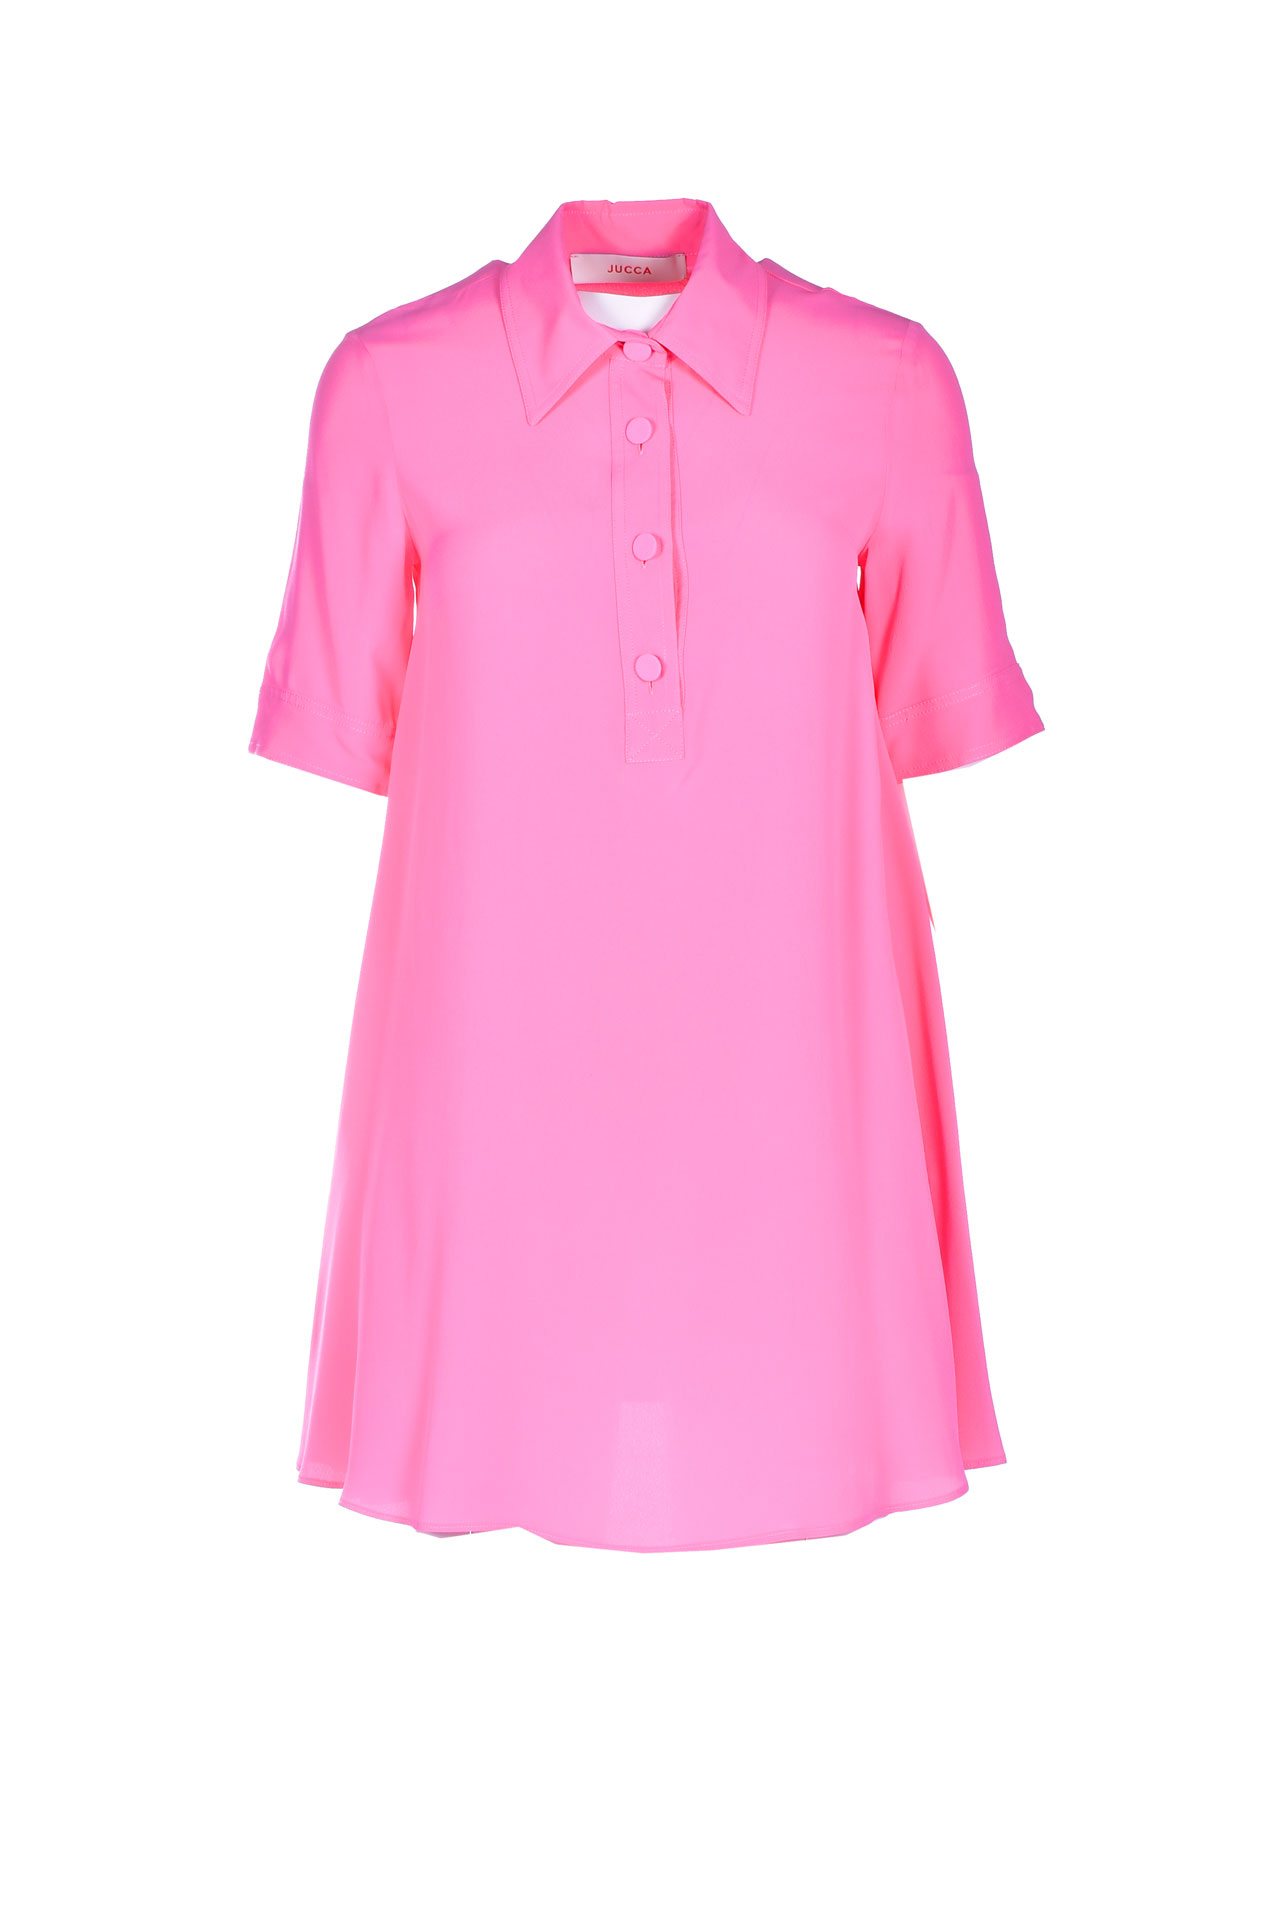 Mini polo dress in bright pink crepe JUCCA |  | J33170111701